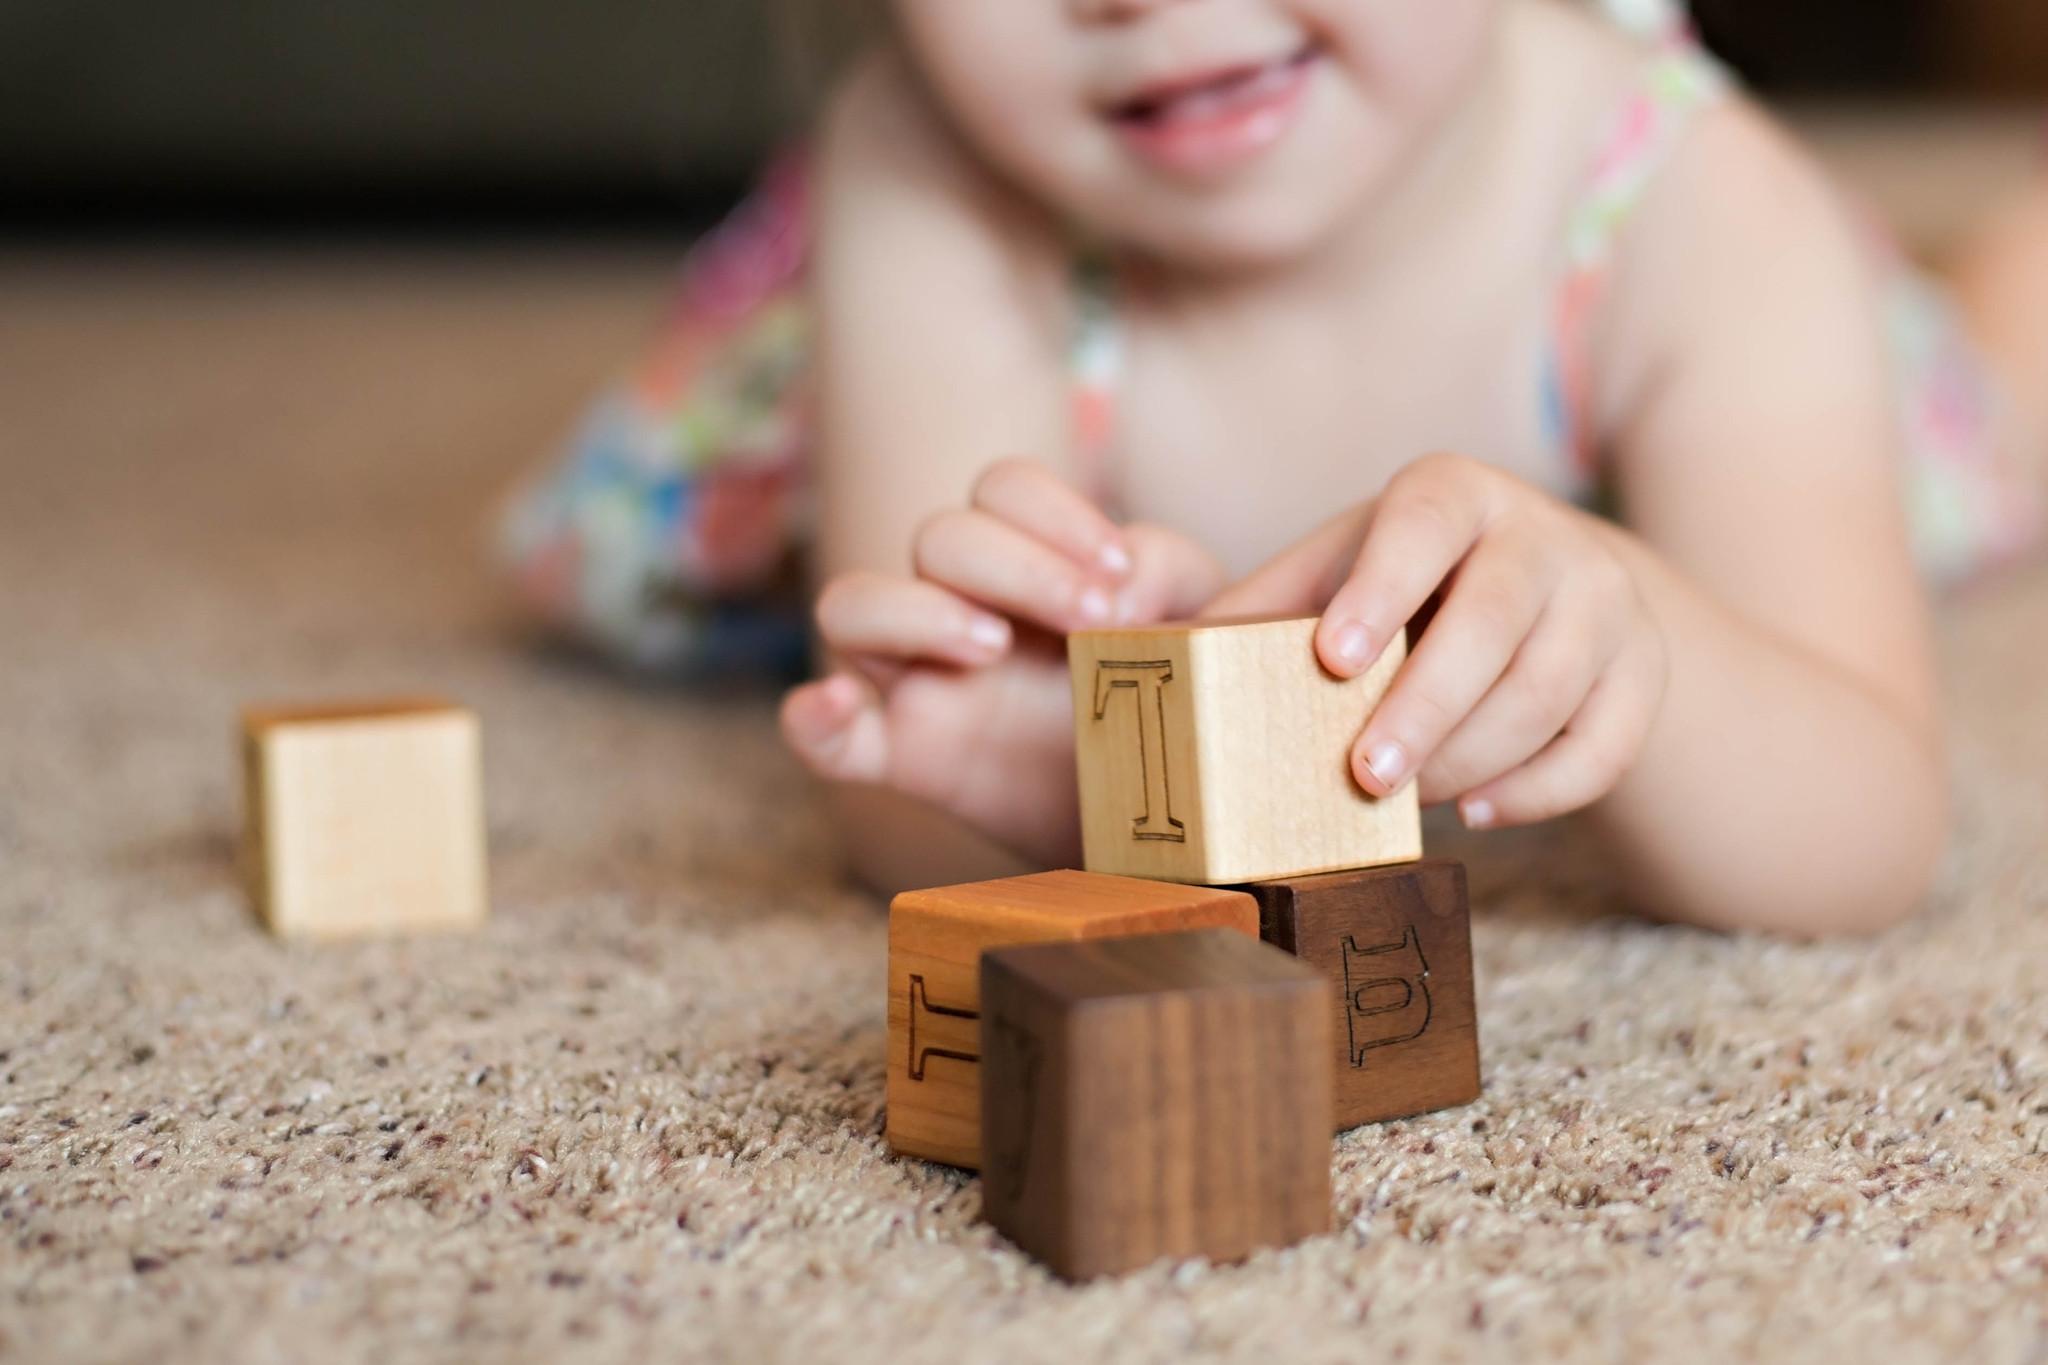 BL000-alphabet-wooden-blocks-handmade-natural-smiling-tree-toys-04_5c9864d3-013f-44c4-a340-c50802d5b8d8